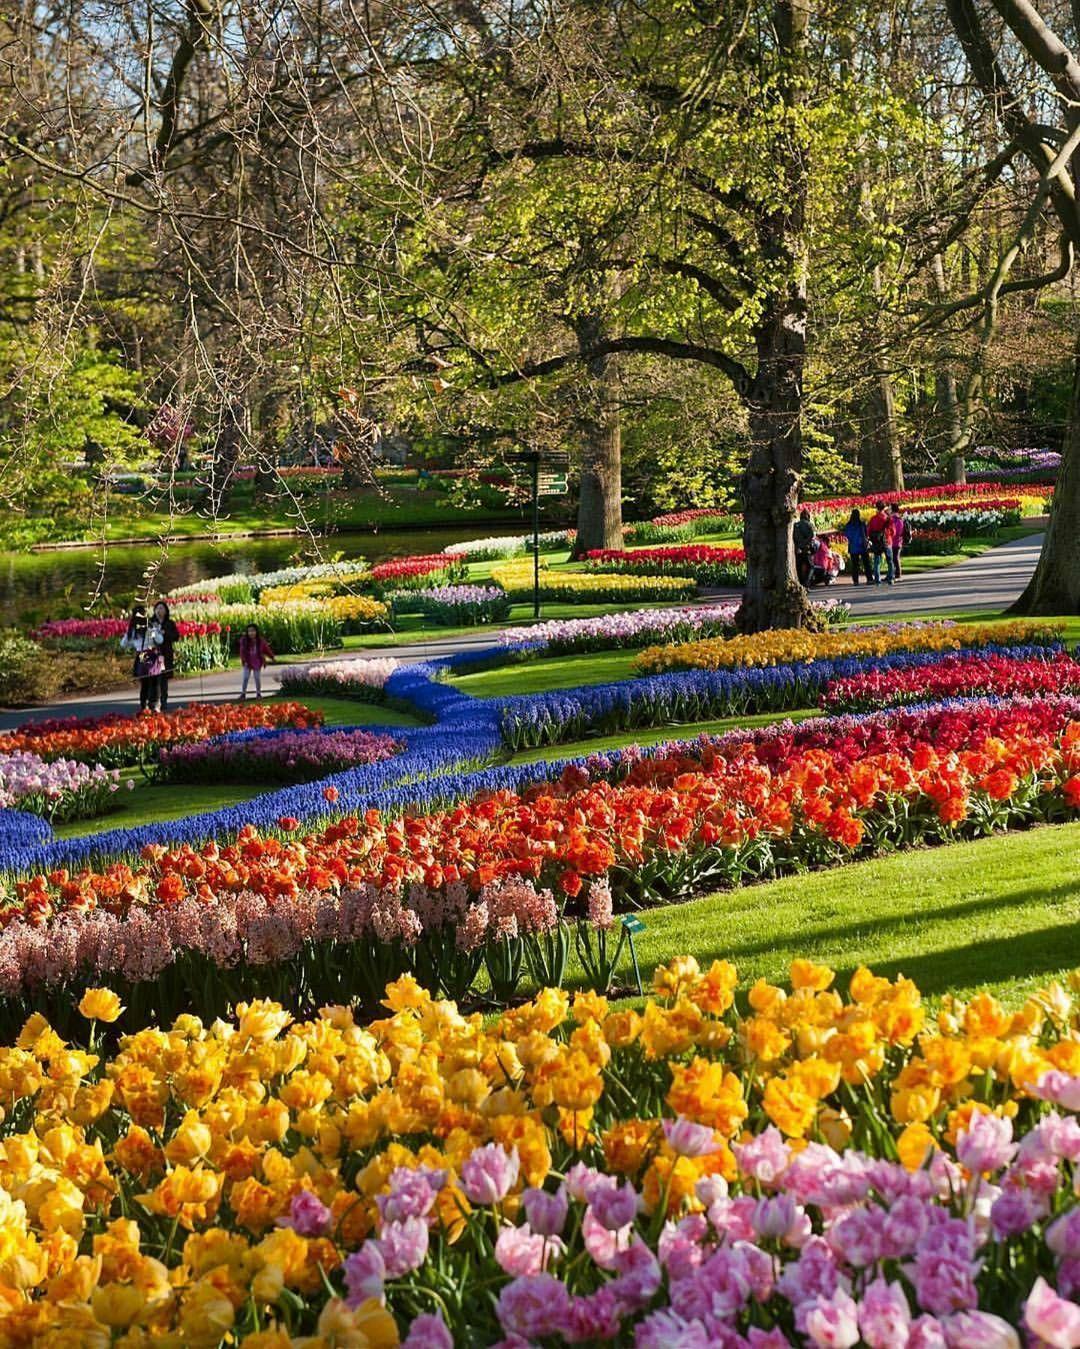 Beautiful Flowers During The Tulip Bloom At Keukenhof ... intérieur Jardin De Keukenhof